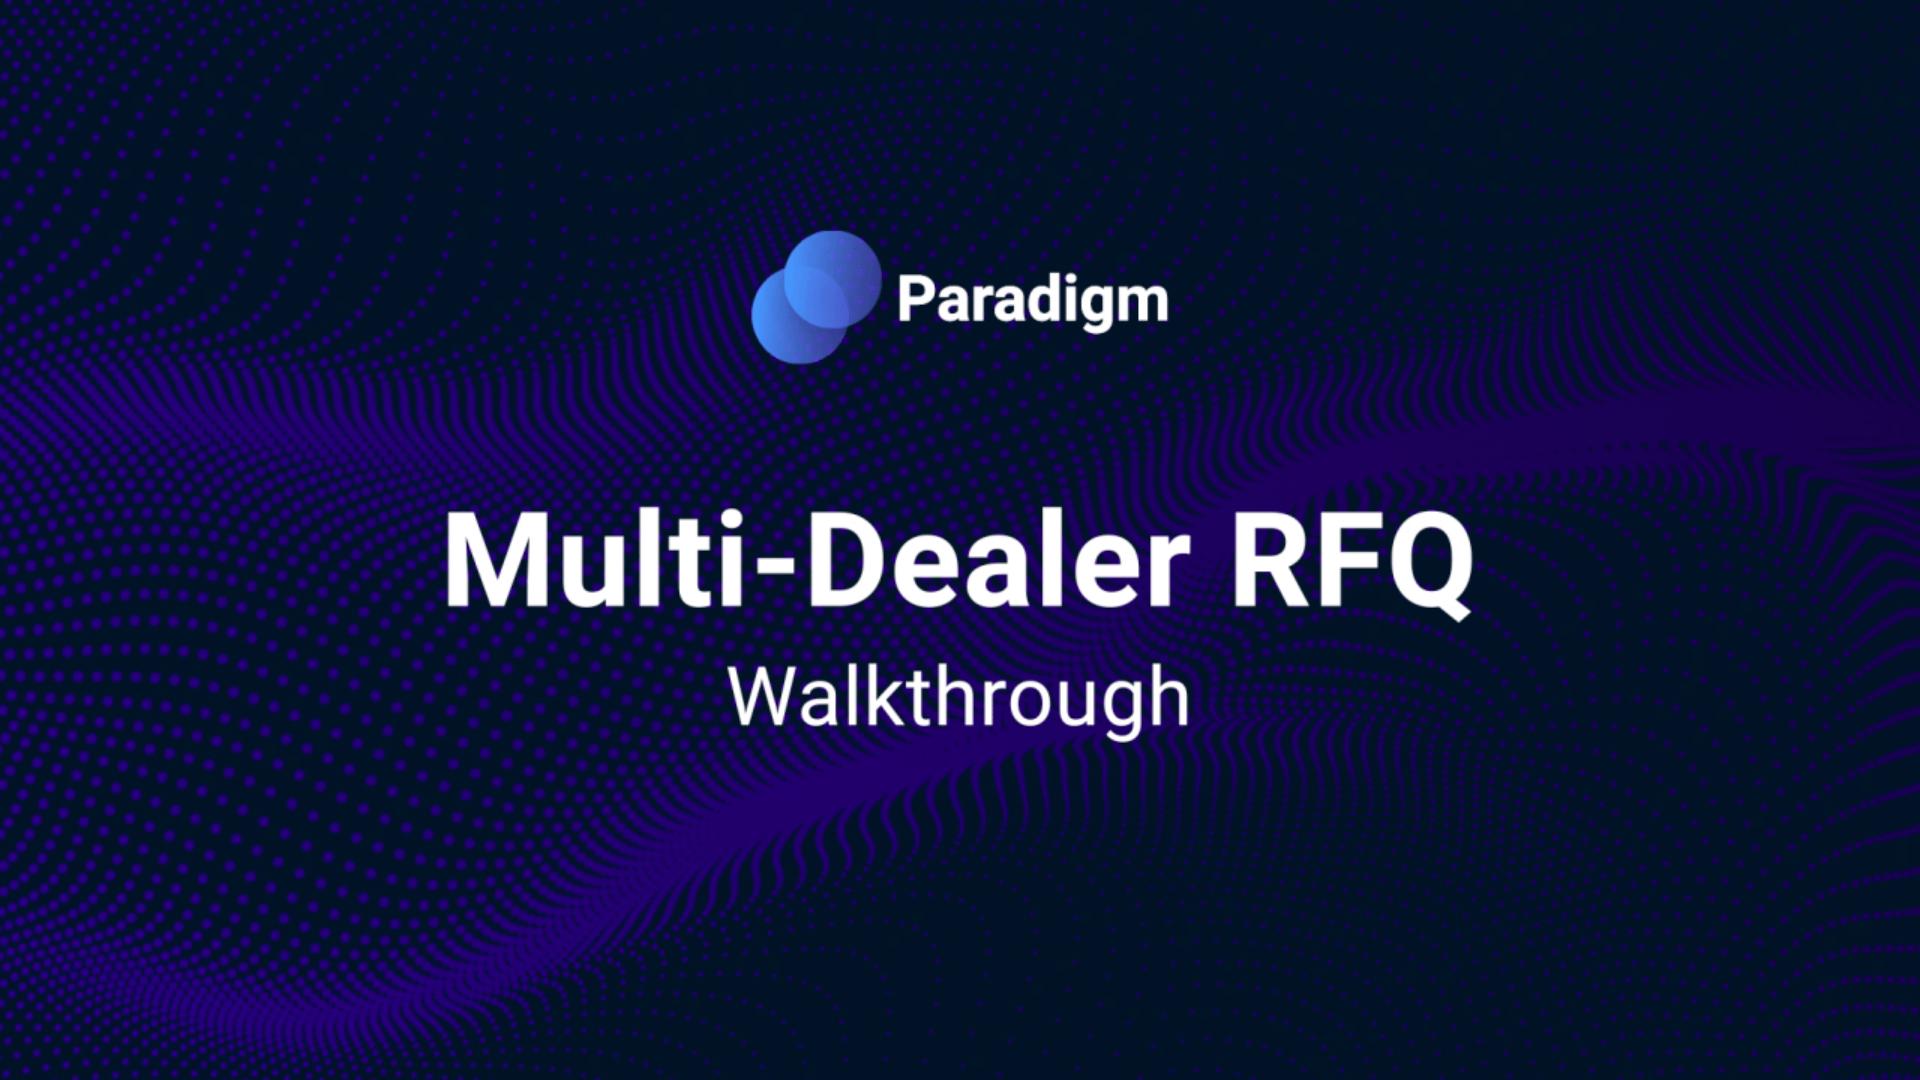 Multi-Dealer RFQ Walkthrough